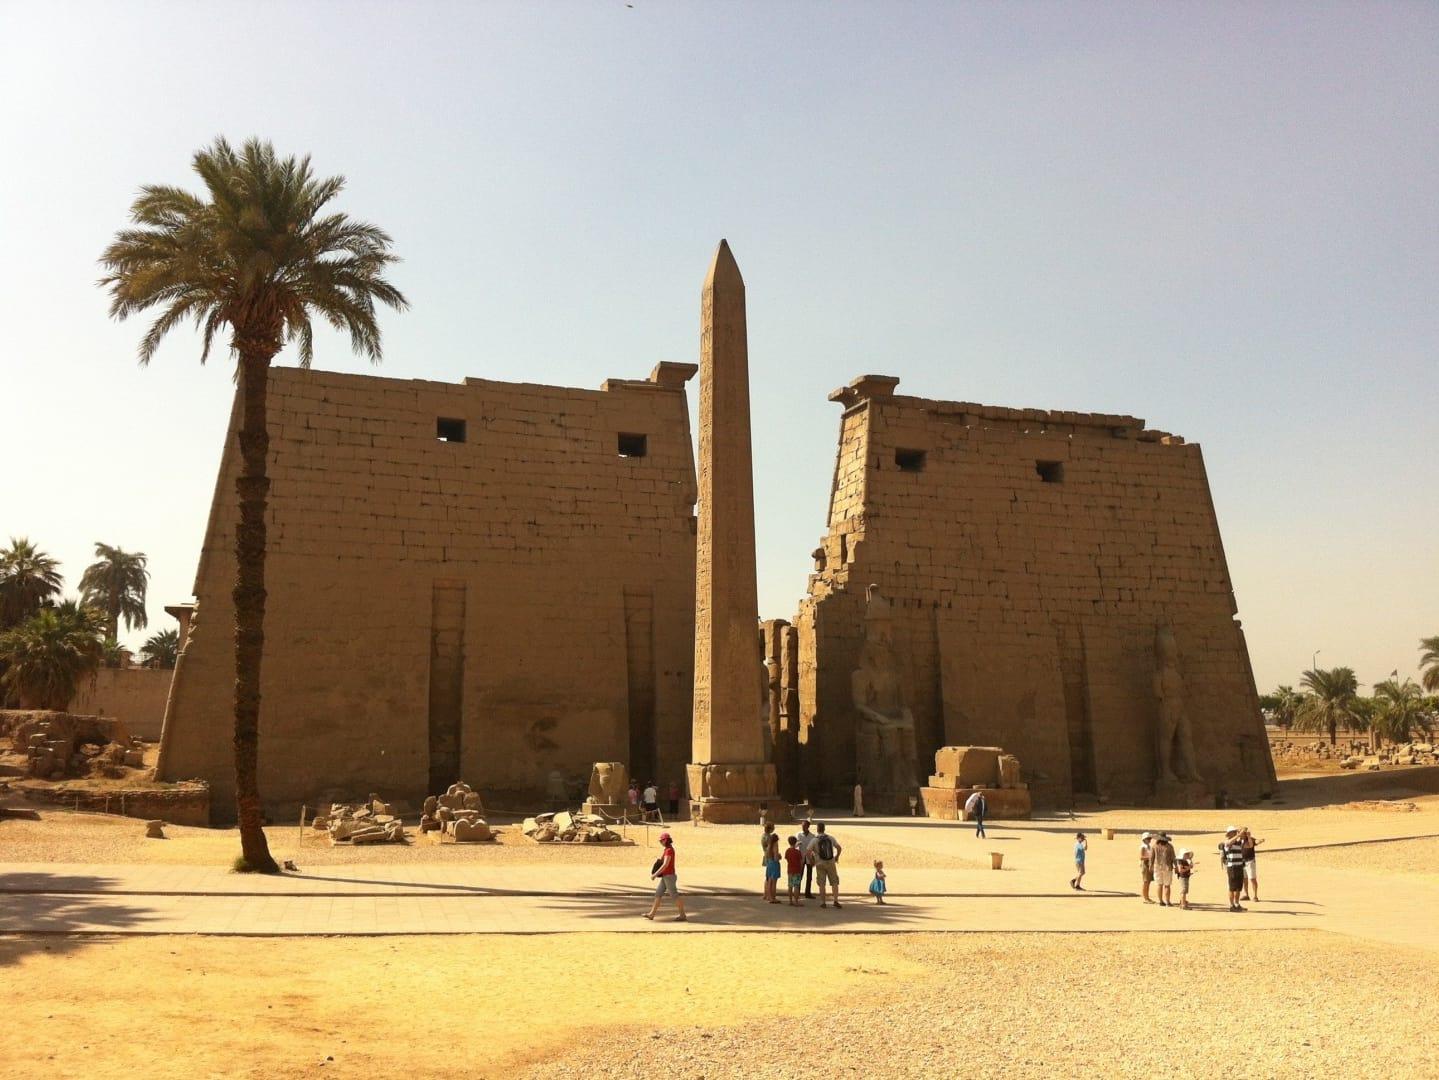 http://innsikten.no/bilder/files/Luxor%202019/248.jpg